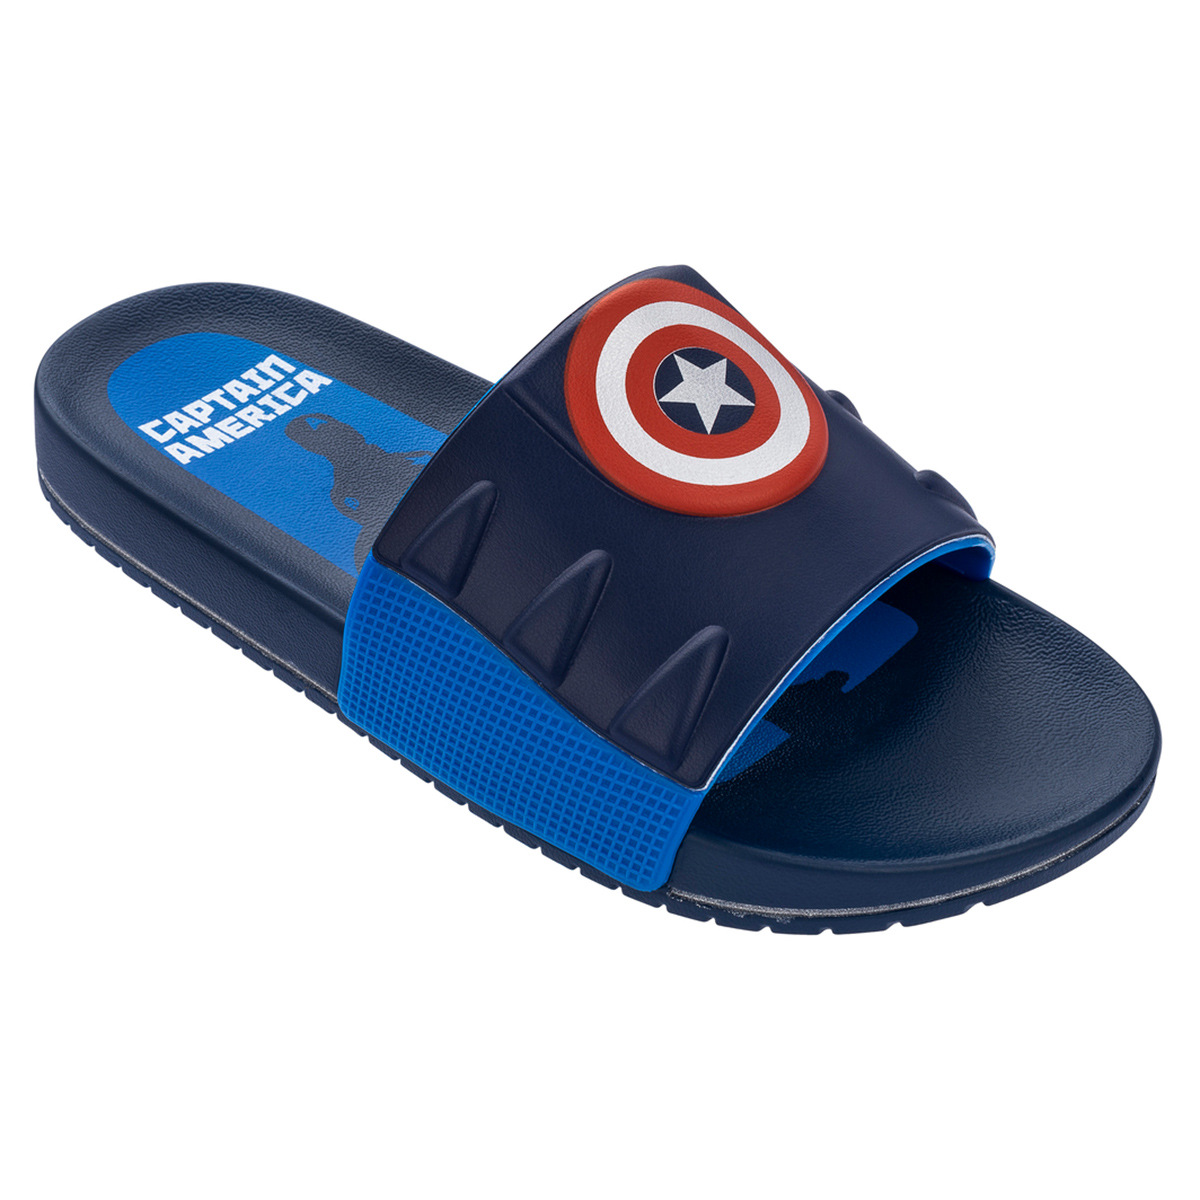 Chinelo Marvel Capitão America Slide